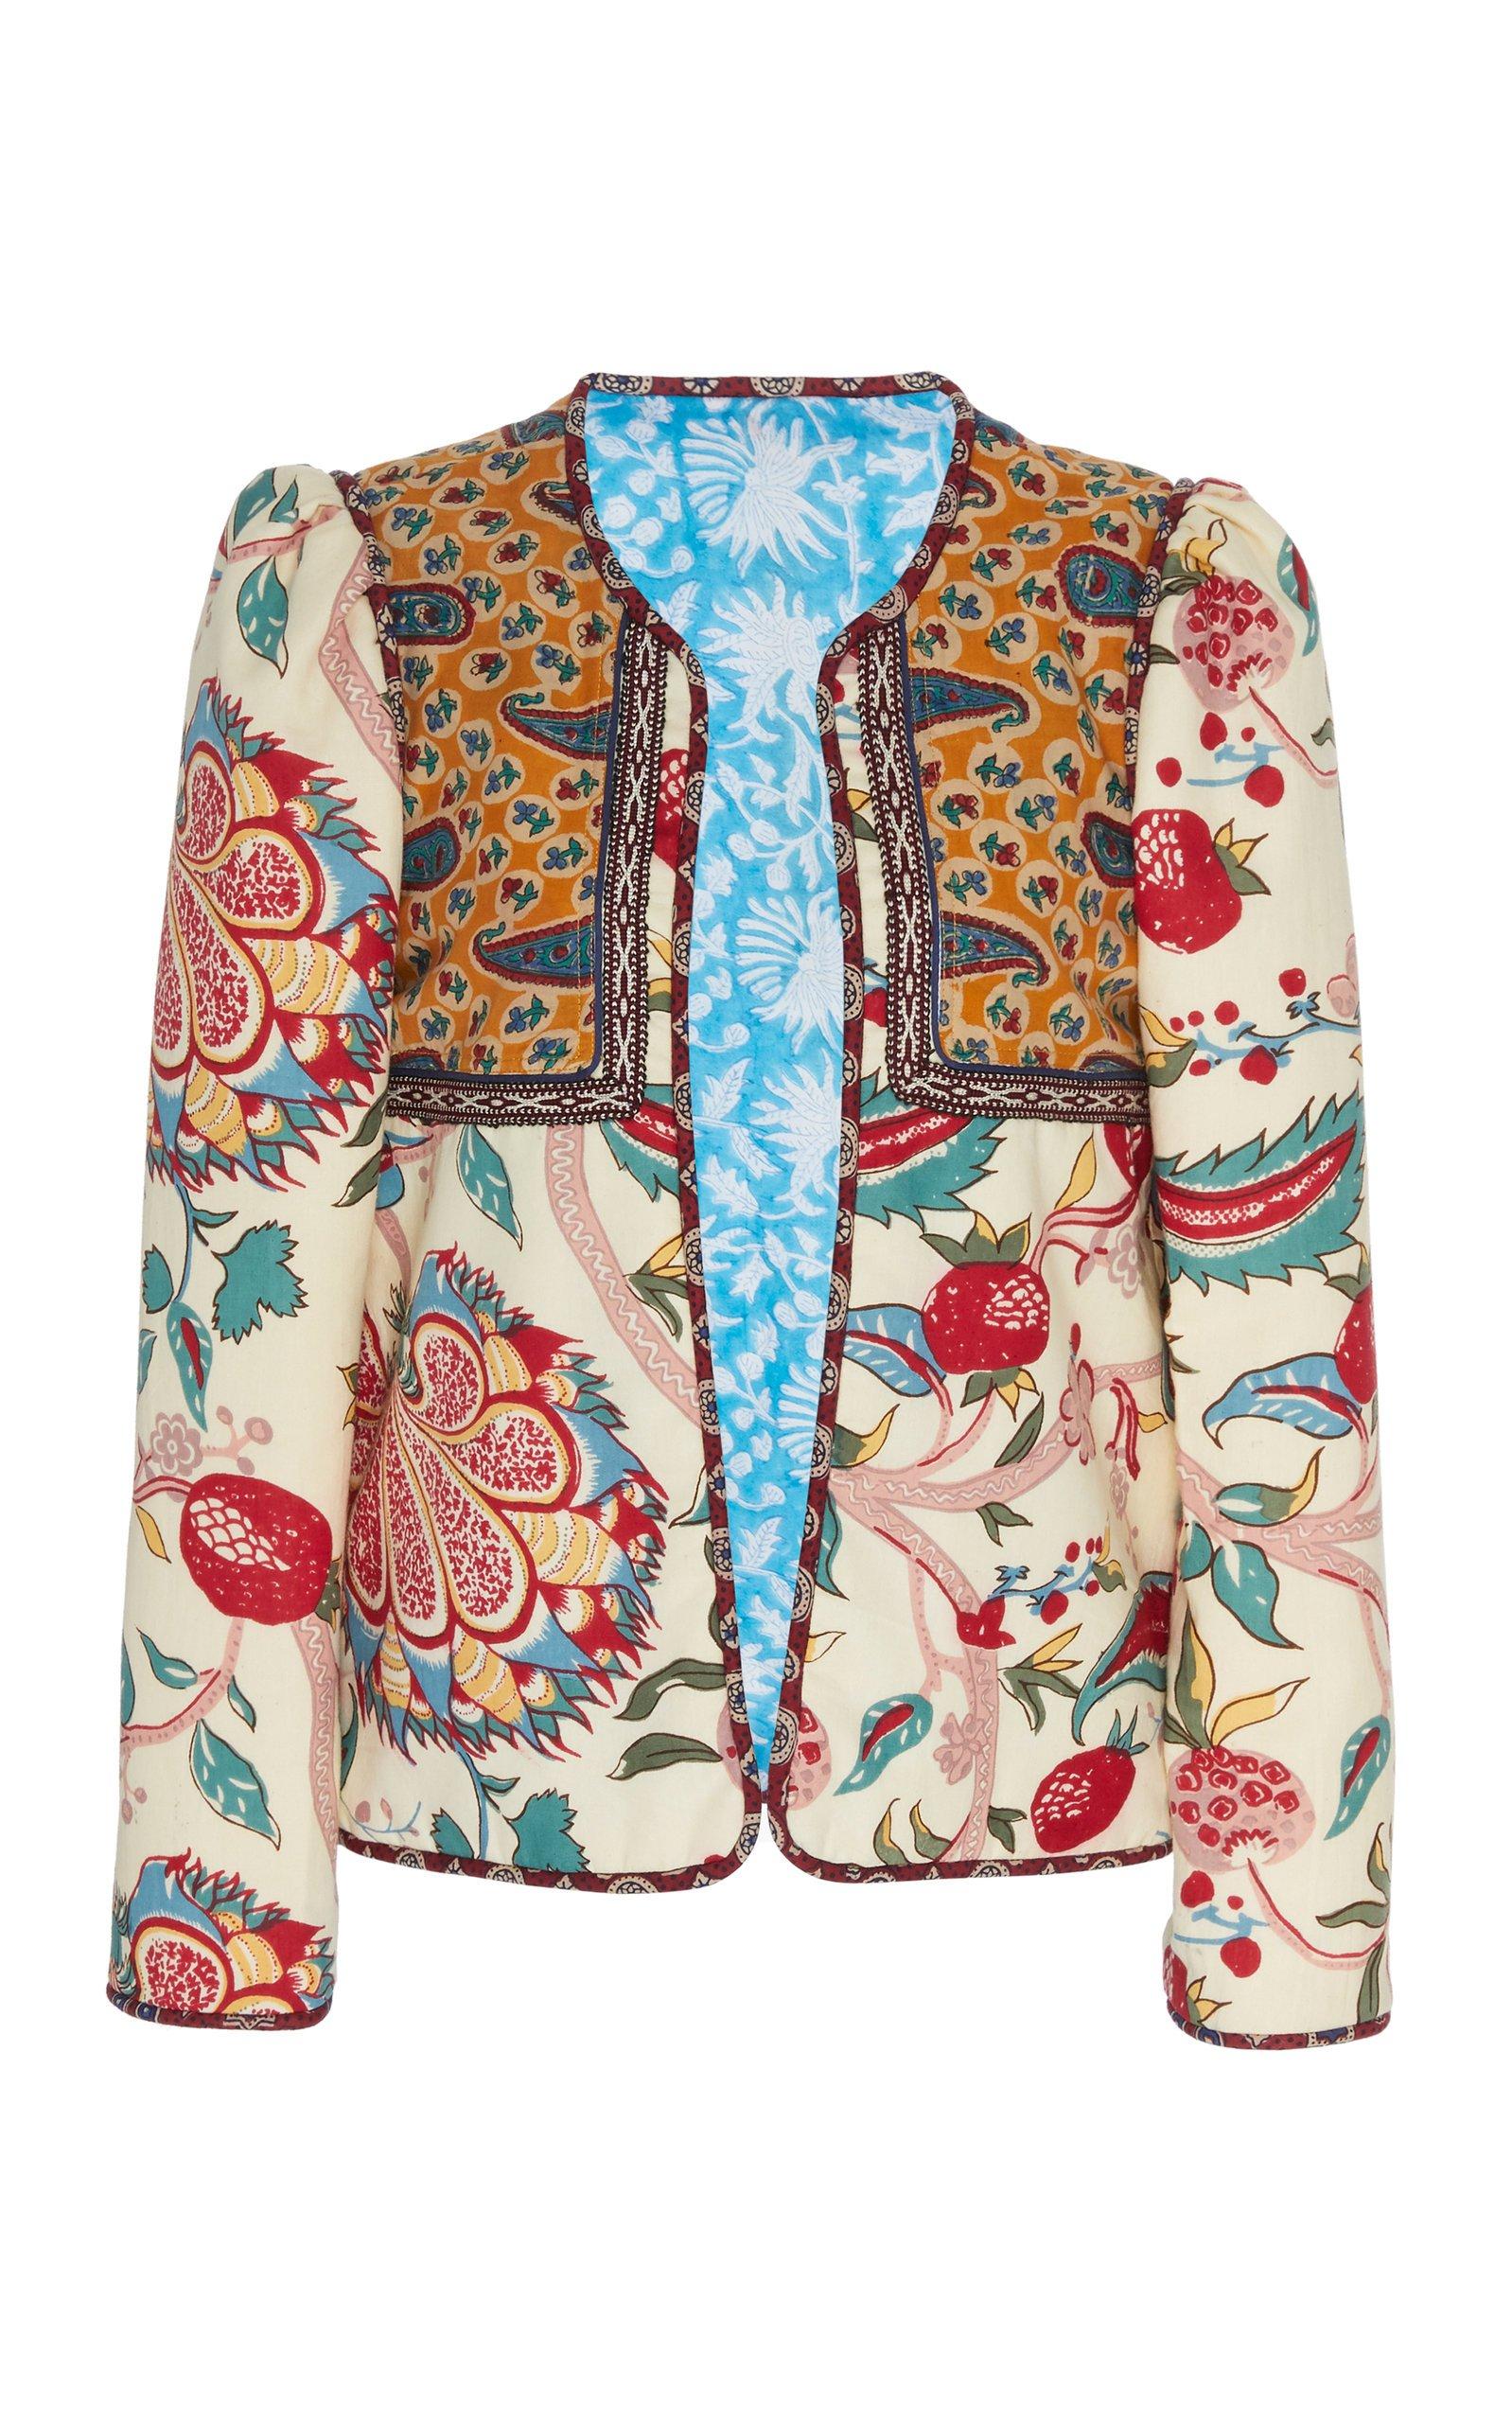 Alix of Bohemia Pomegranate Cotton Jacket Size: M